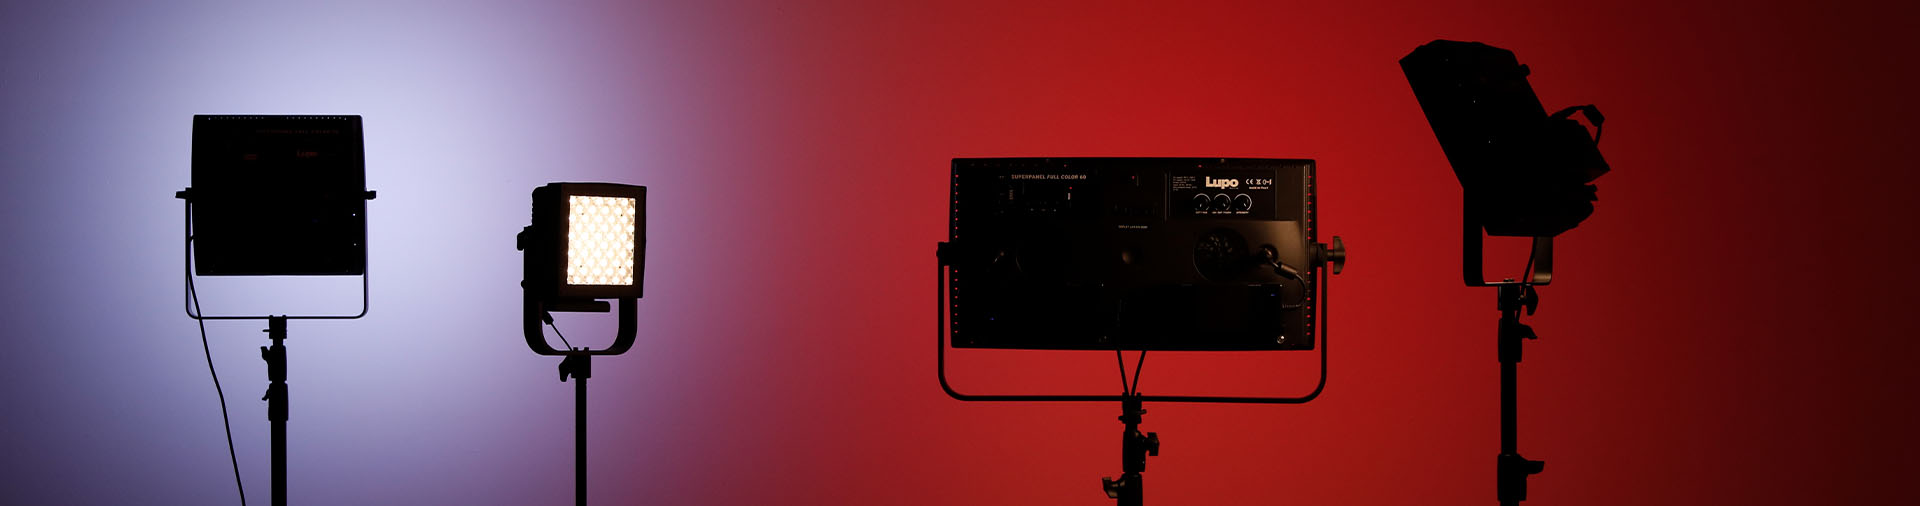 lupo-LED-lighting-range-against-red-and-blue-background